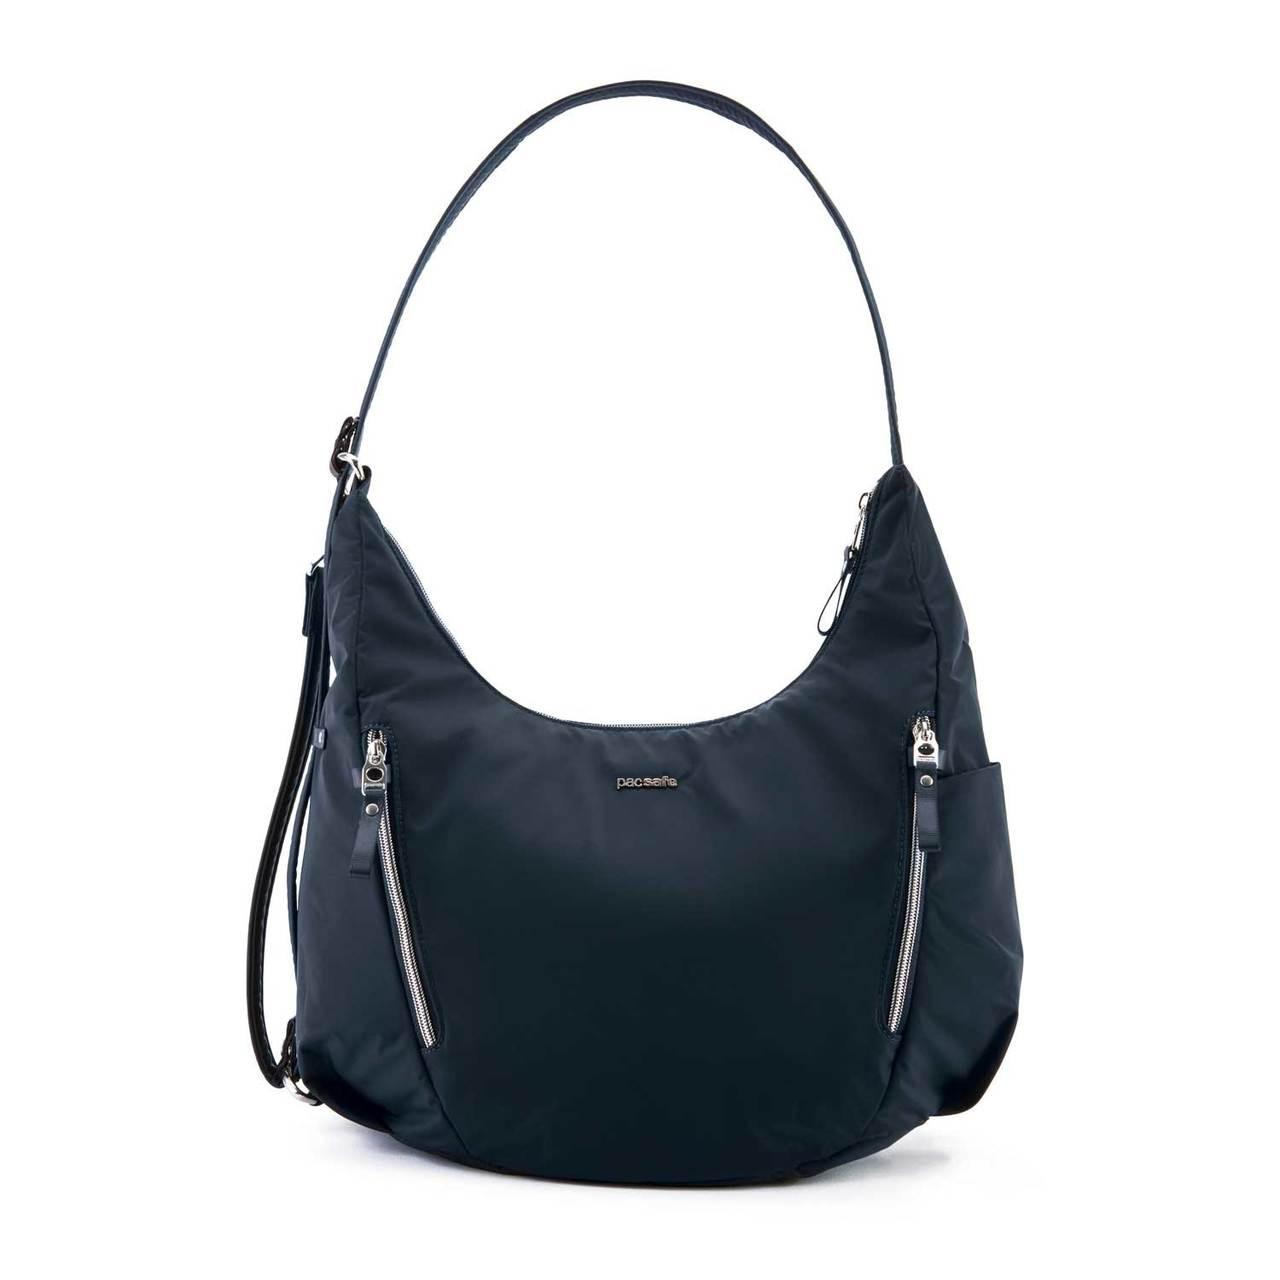 Pacsafe Stylesafe Convertible Crossbody anti-theft travel handbag at ... 0616bcc8e7415